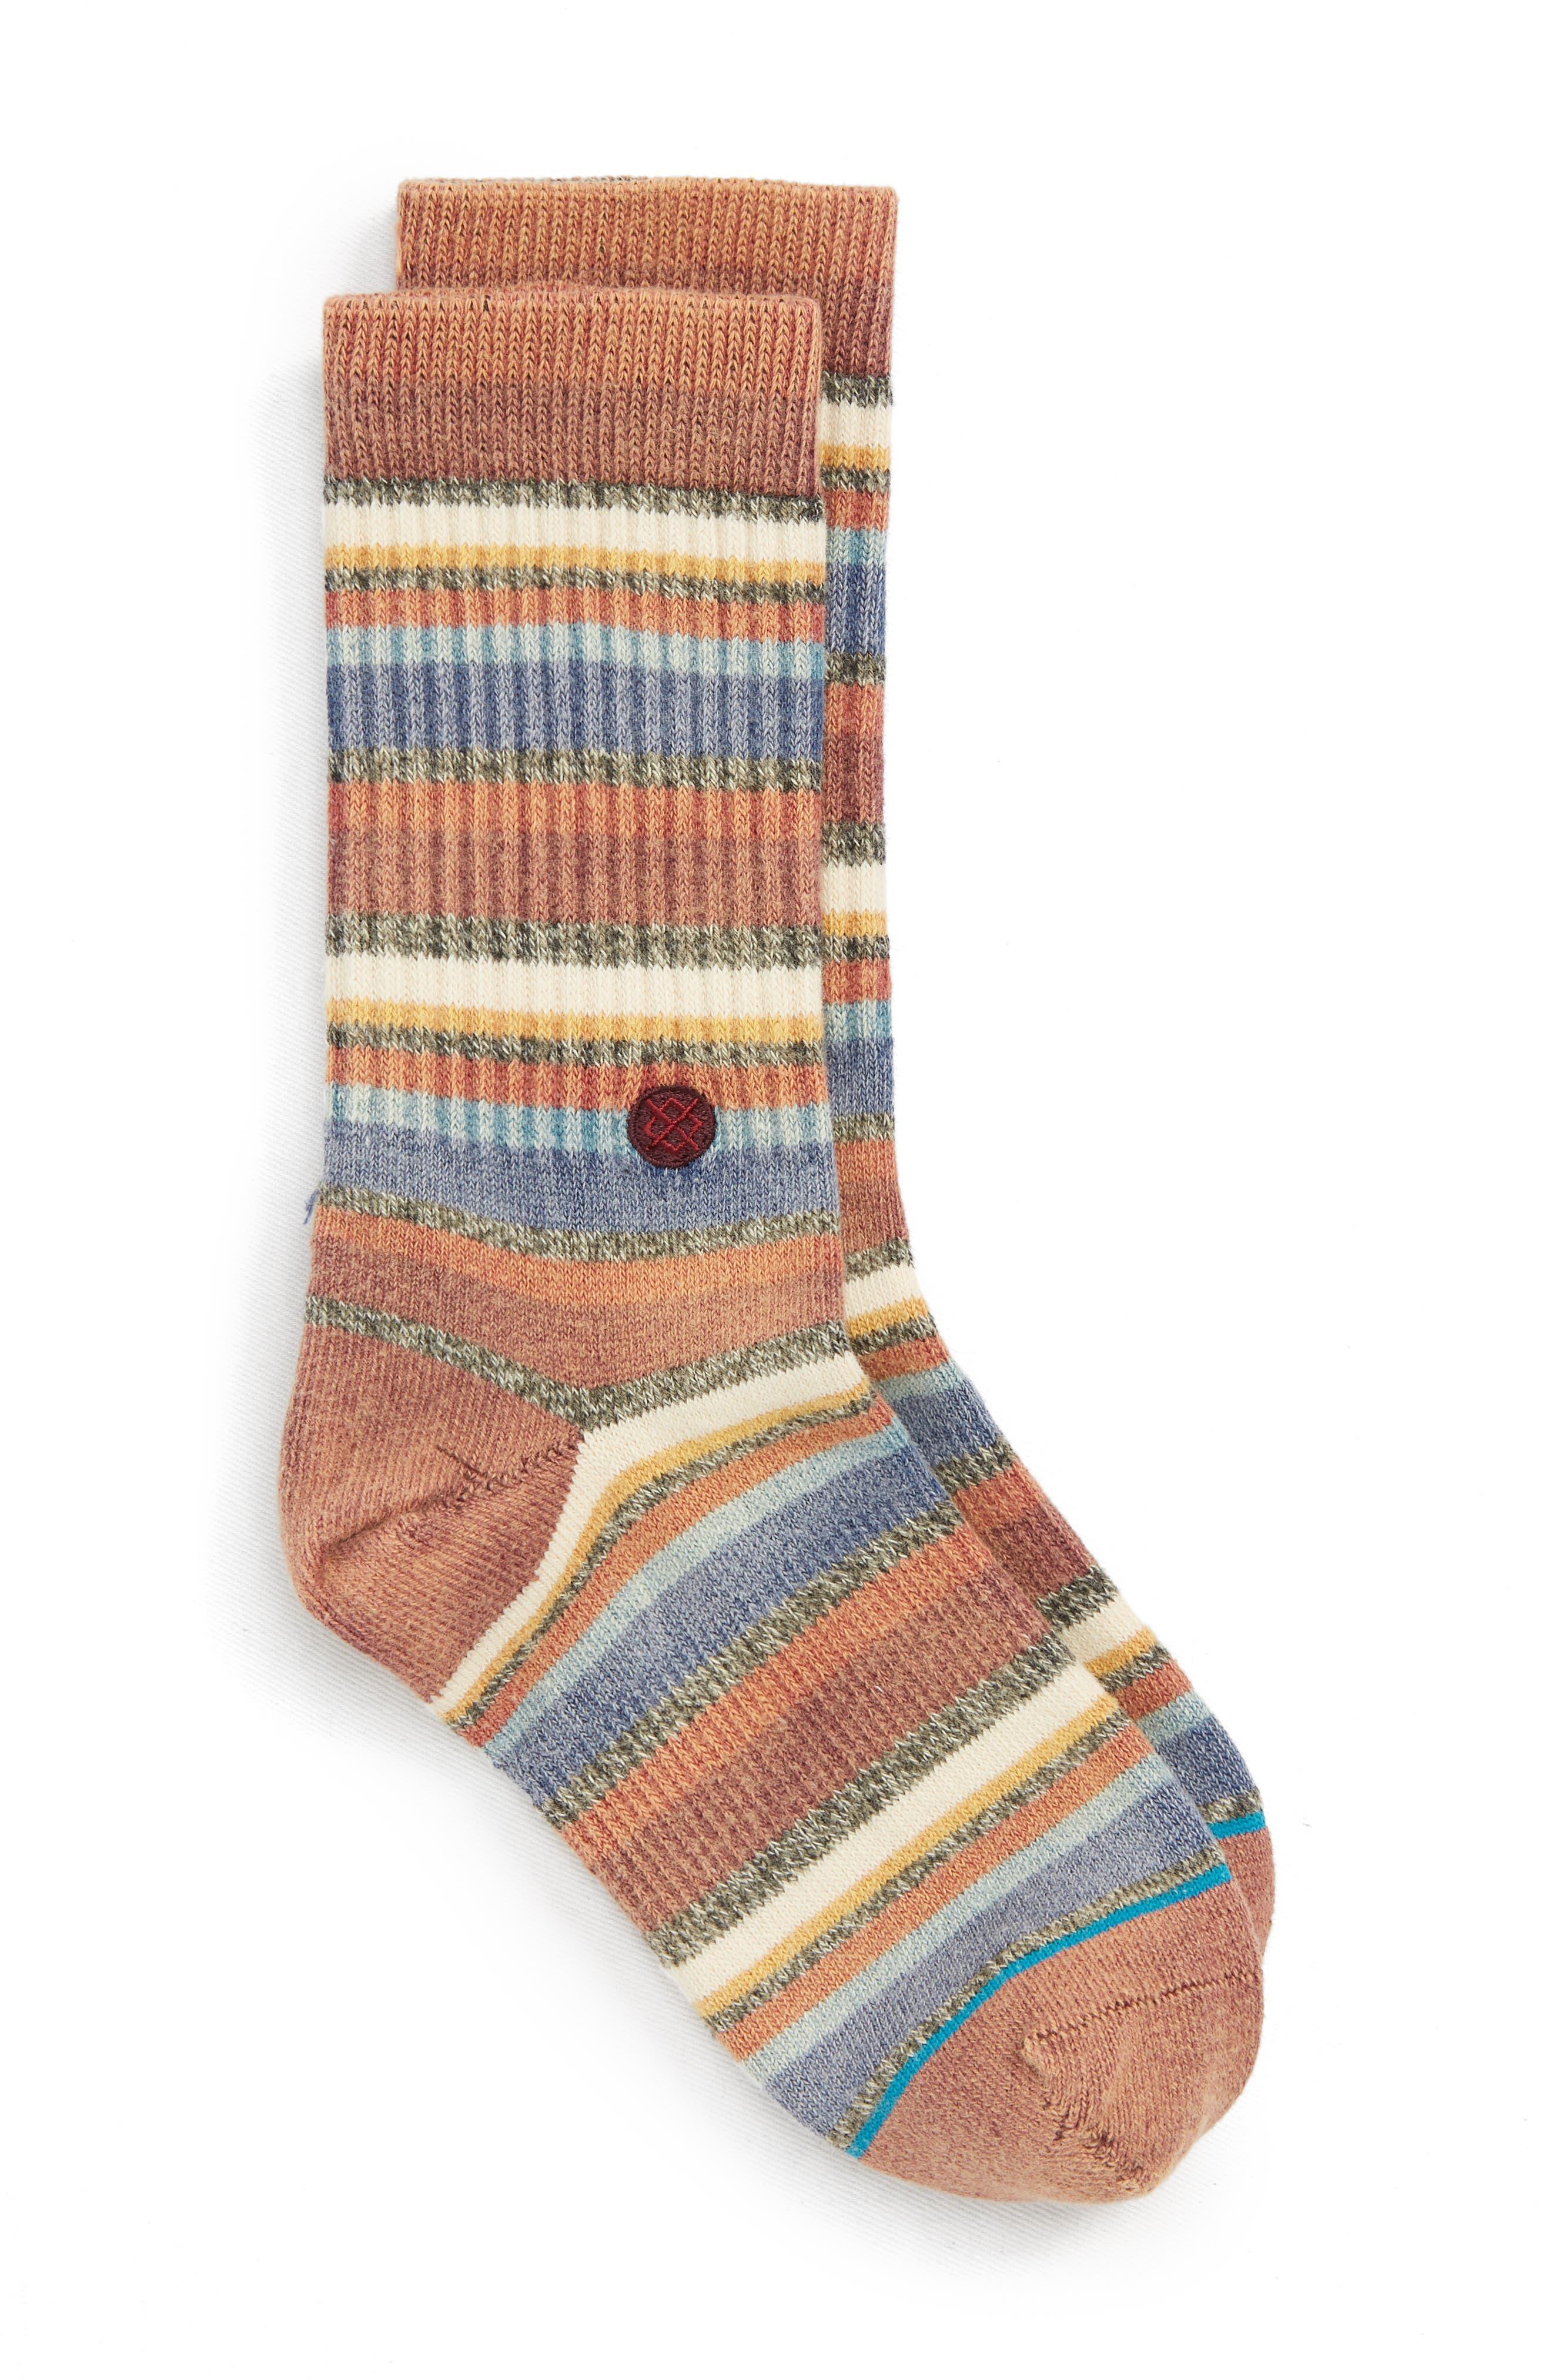 Riot Striped Socks,                             Main thumbnail 1, color,                             601